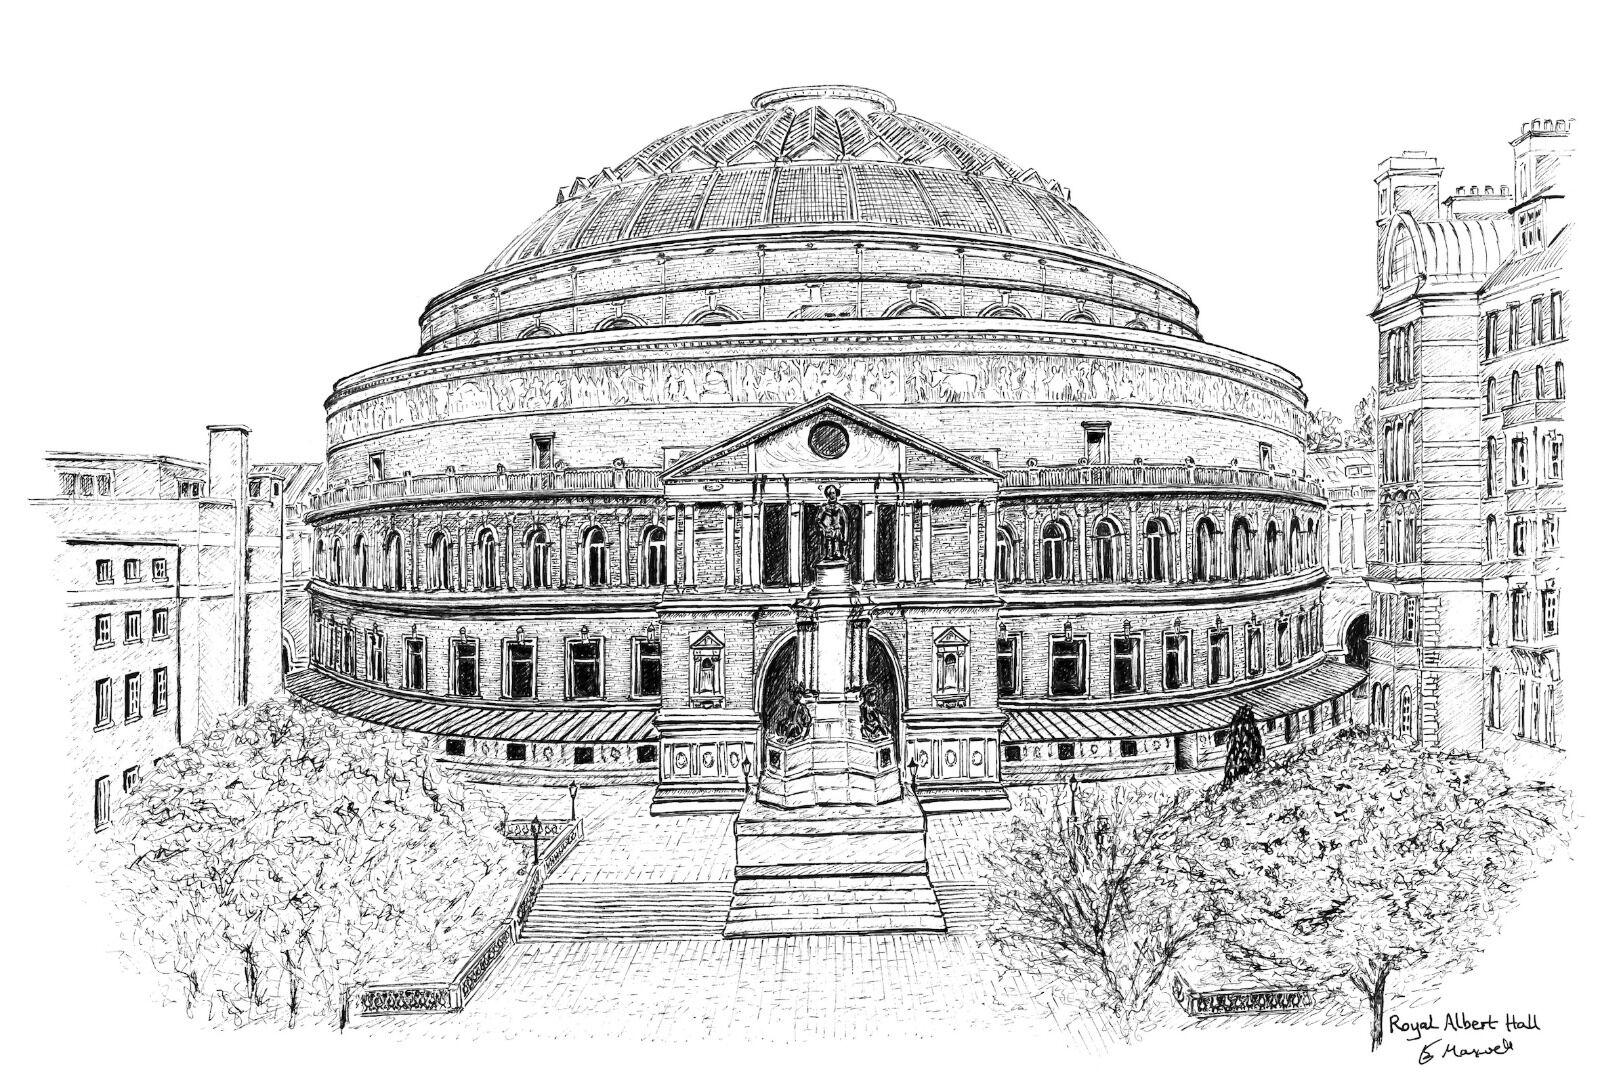 Royal Albert Hall (b&w version)